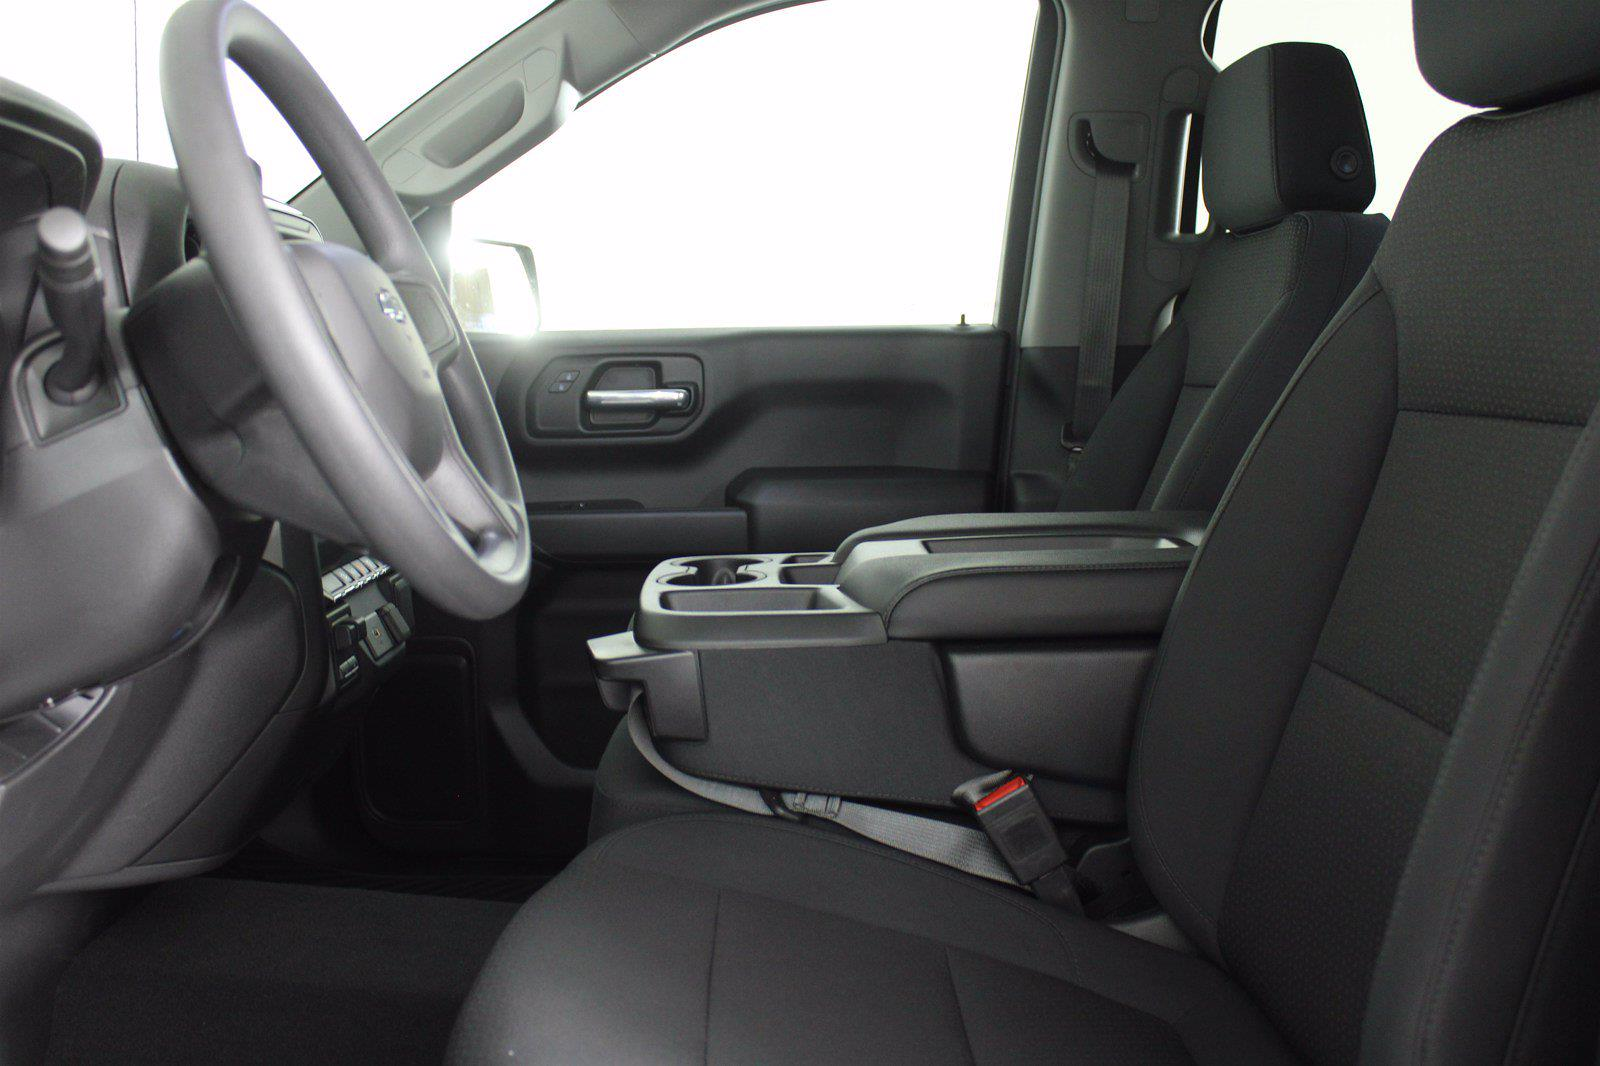 2020 Chevrolet Silverado 1500 Crew Cab 4x4, Pickup #DTC1713 - photo 7